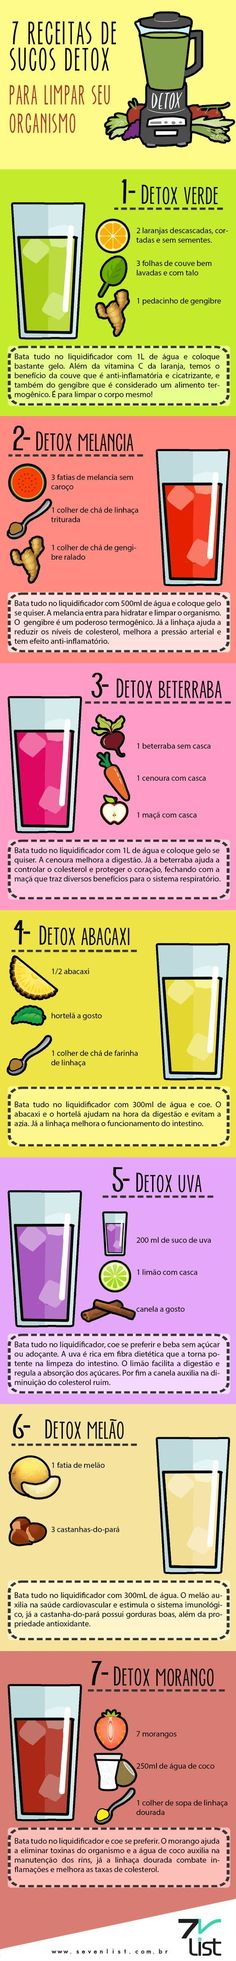 como disminuir el acido urico rapidamente de manera natural medicina natural para la gota ciatica dieta contra acido urico colesterol